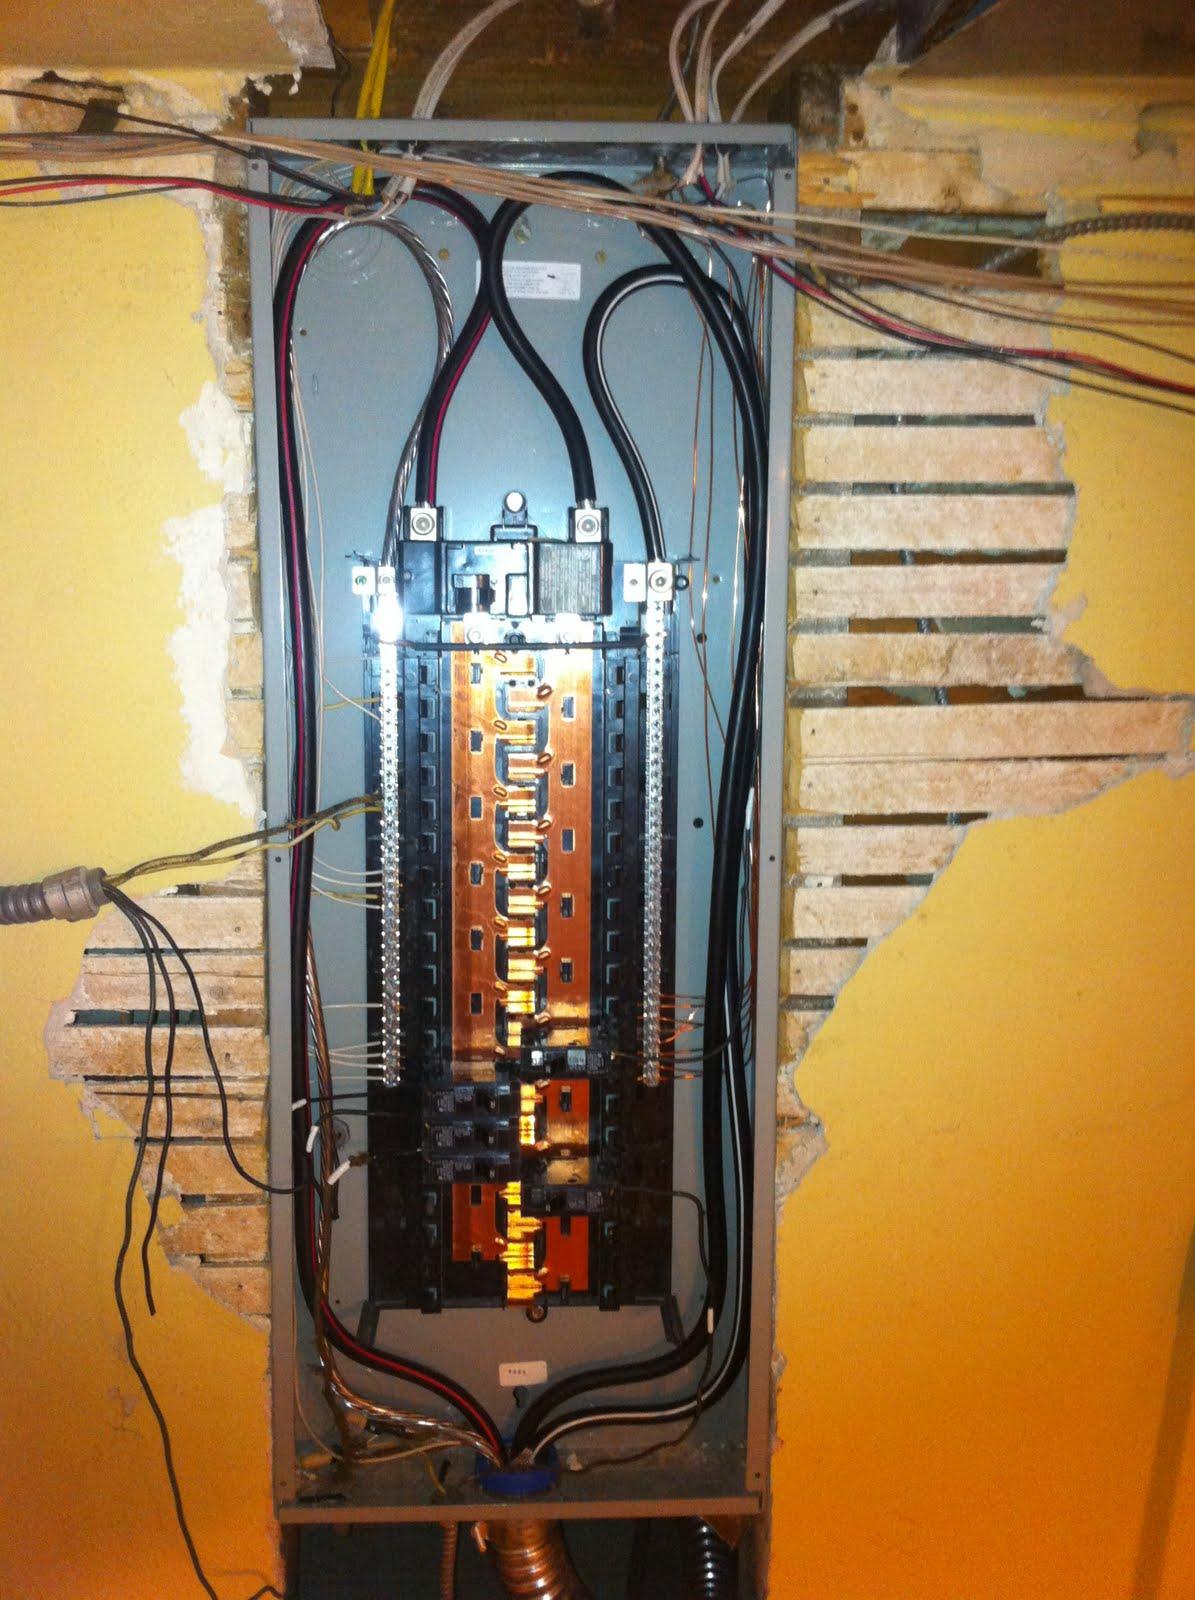 200 Amp Breaker Wiring Diagram | Manual E-Books - 200 Amp Breaker Box Wiring Diagram